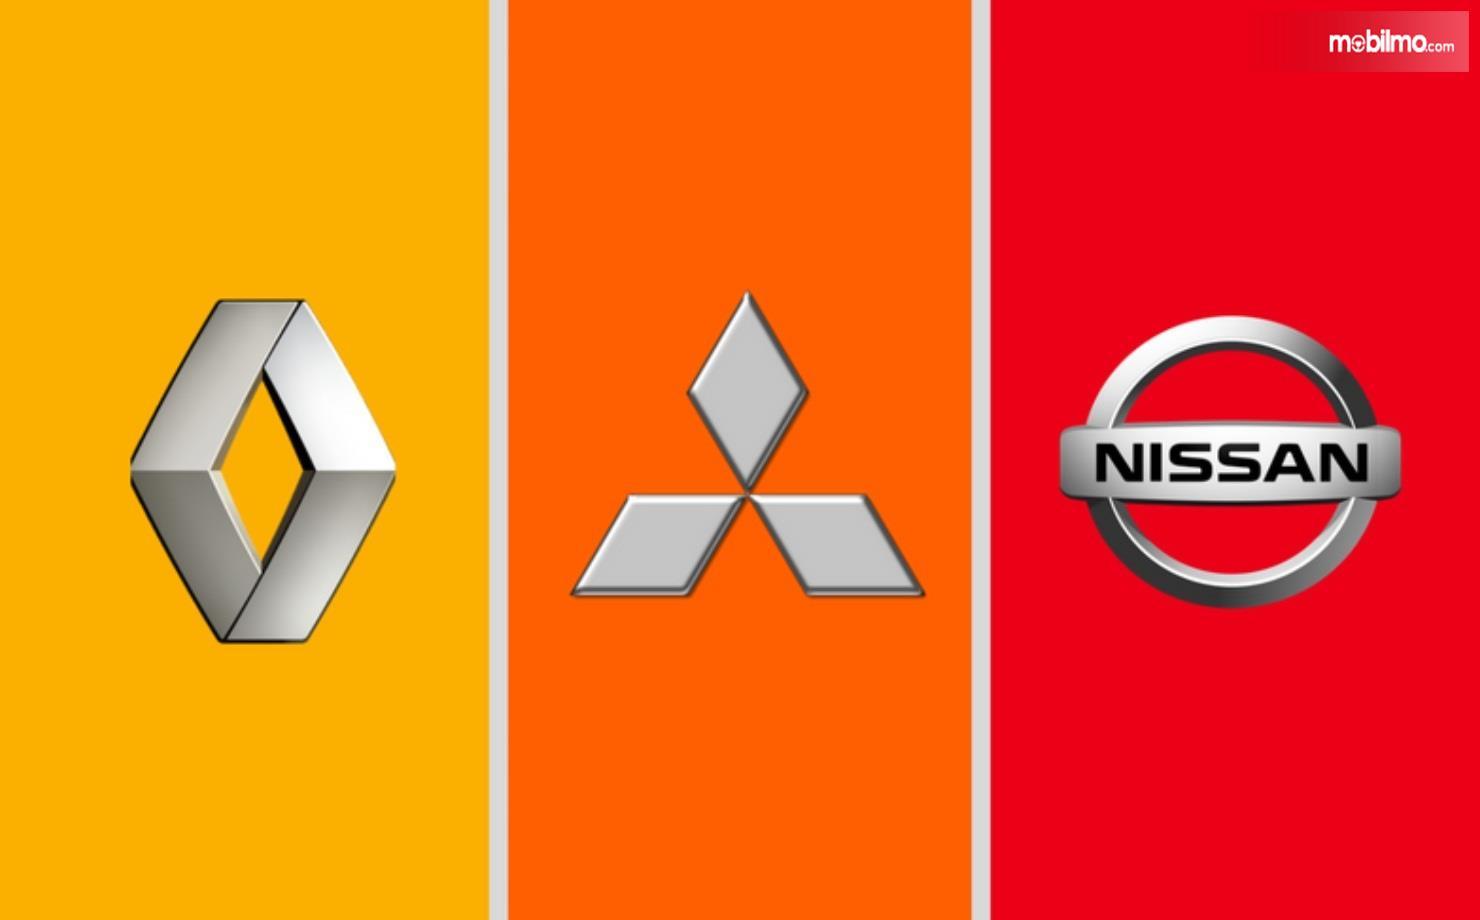 Gambar menunjukkan logo Renault-Mitsubishi-Nissan